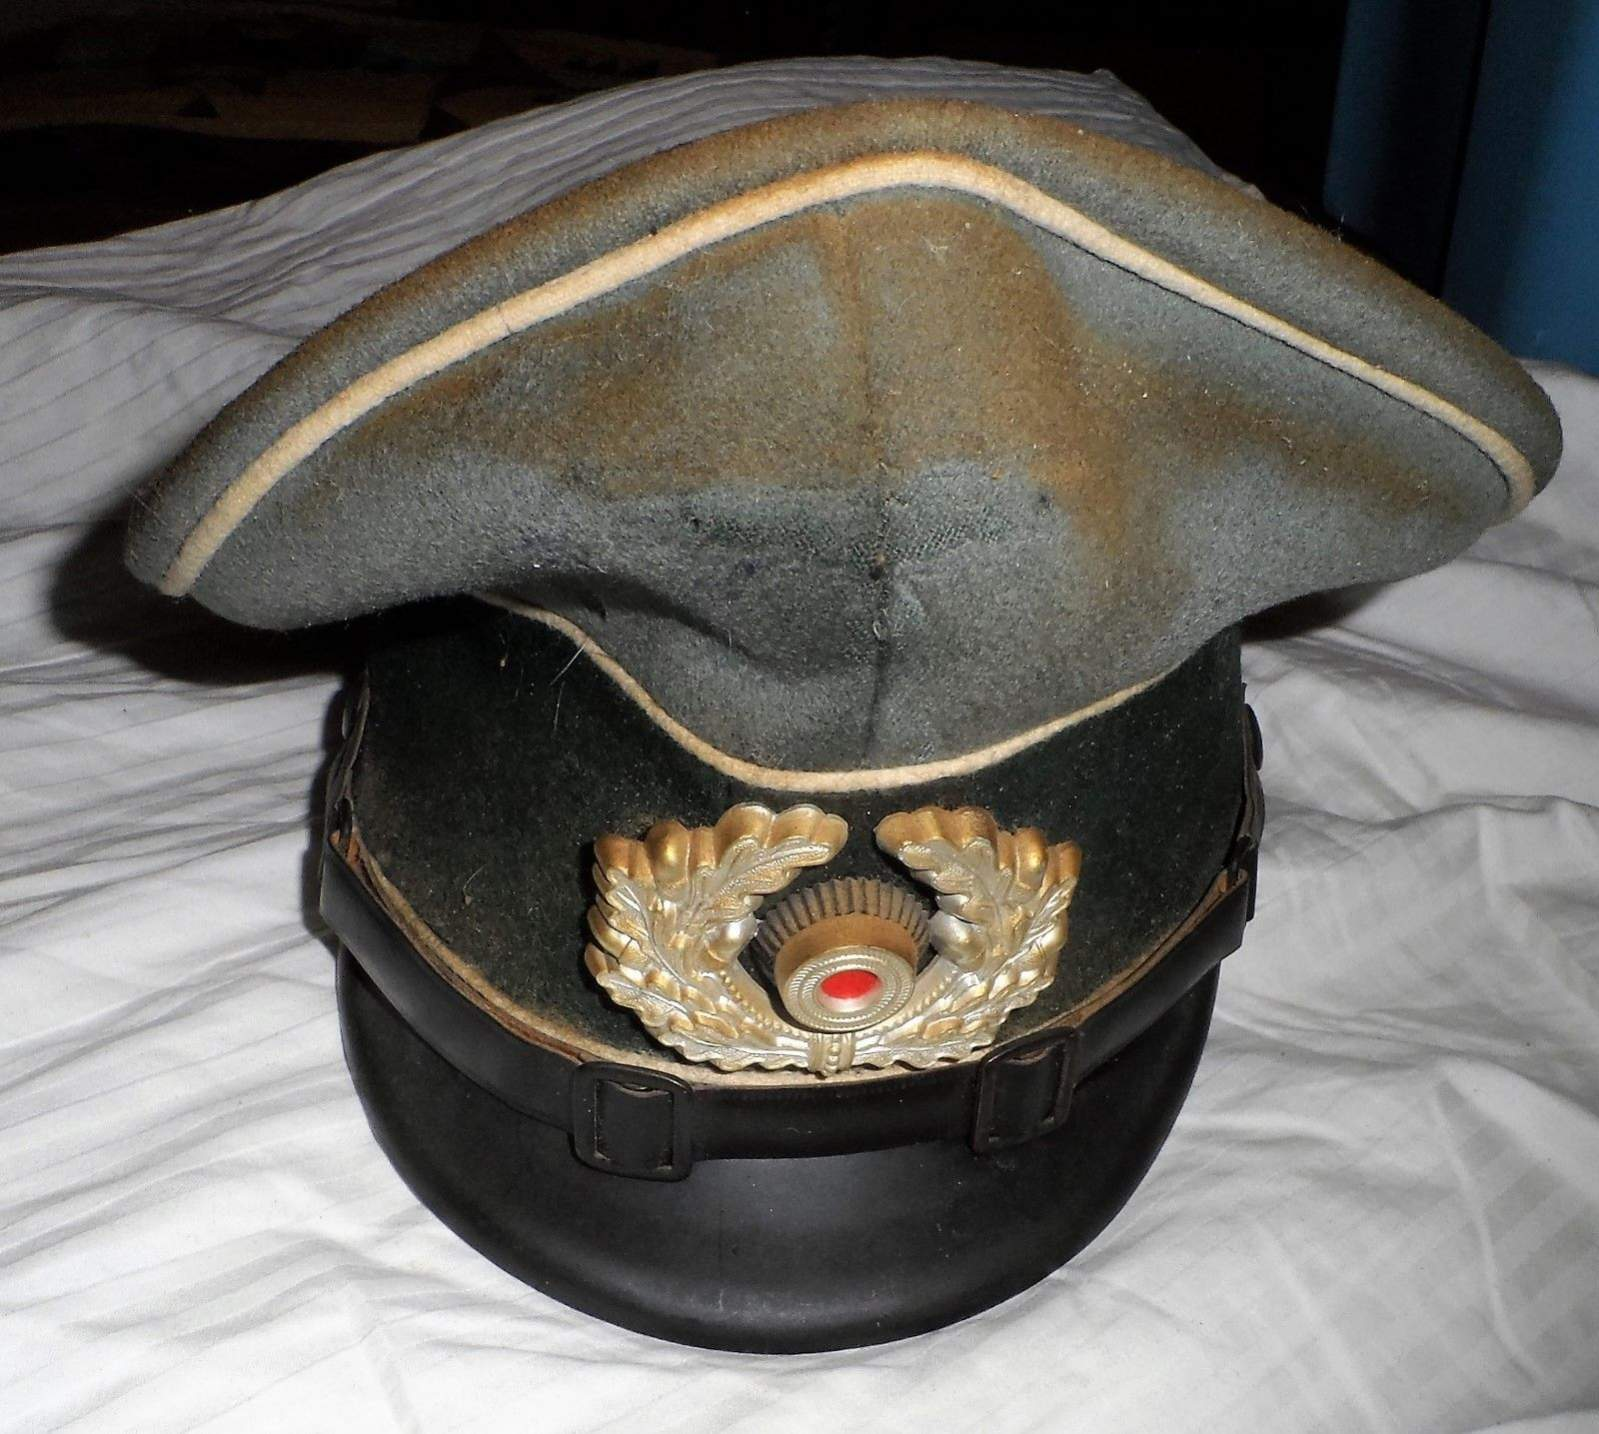 6675db5e11a Flat Cap Hat Ebay - Parchment N Lead